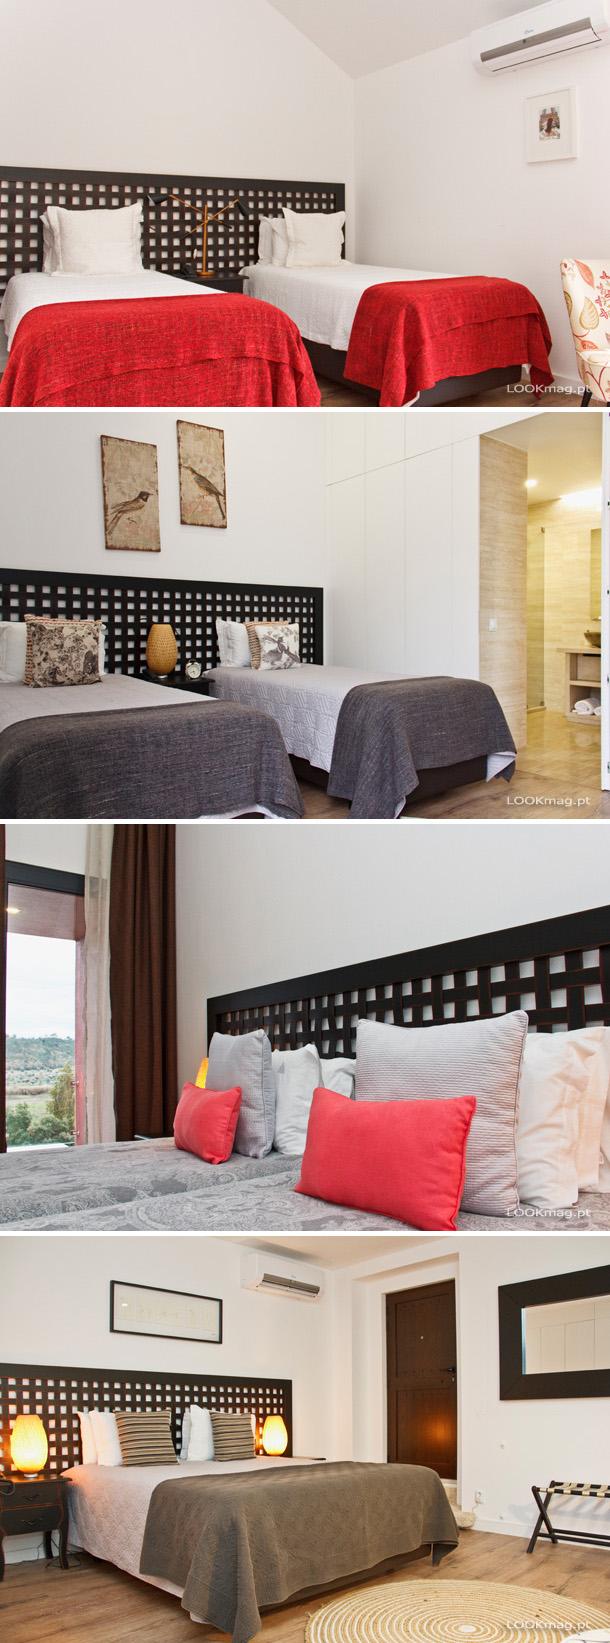 Agartha_Hotel-LOOKmag_pt-9-10-11-12